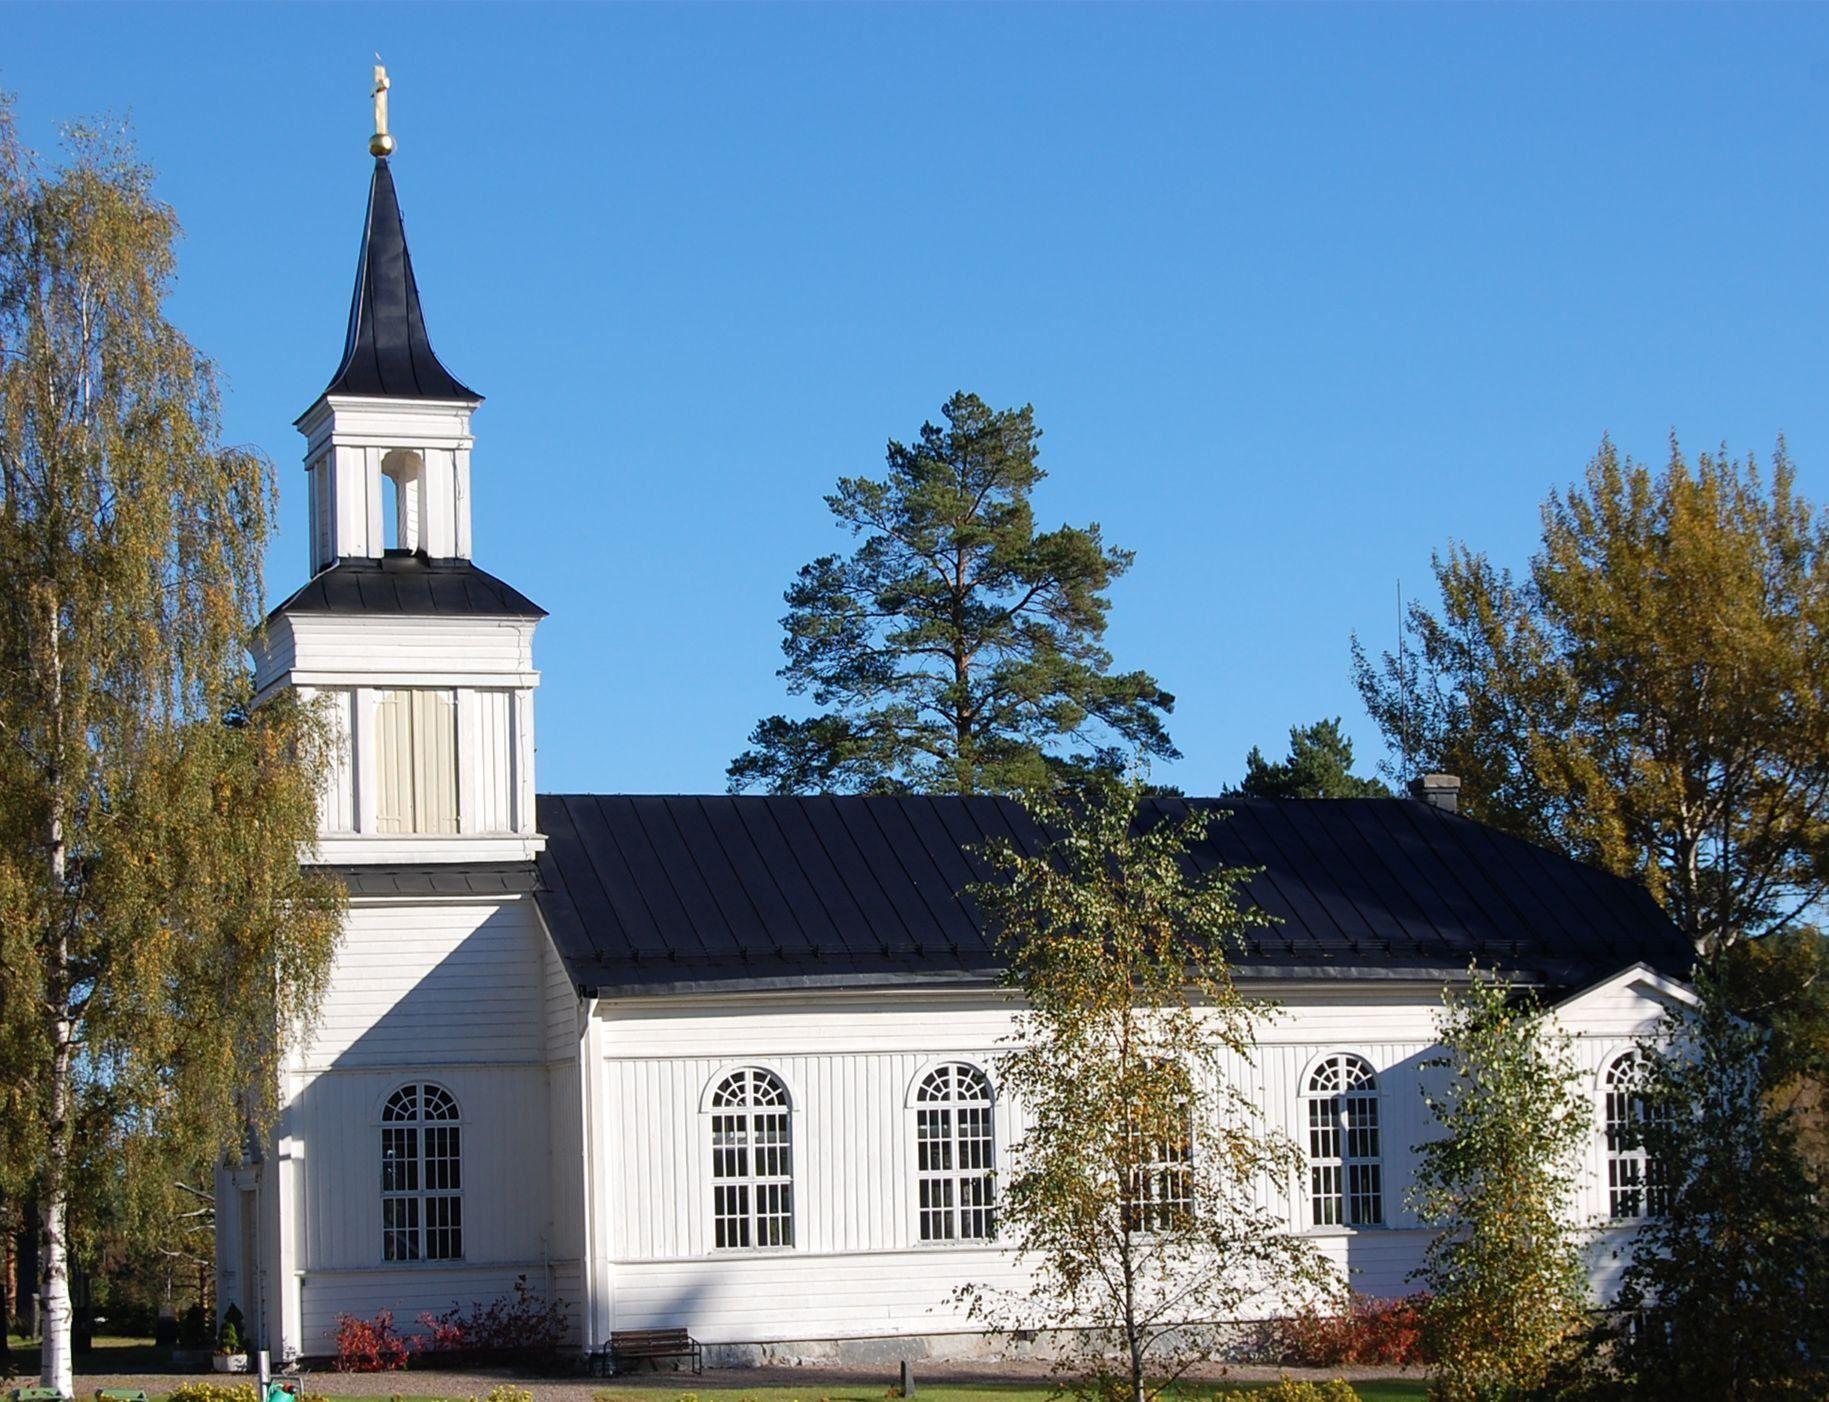 Hemsö kyrka